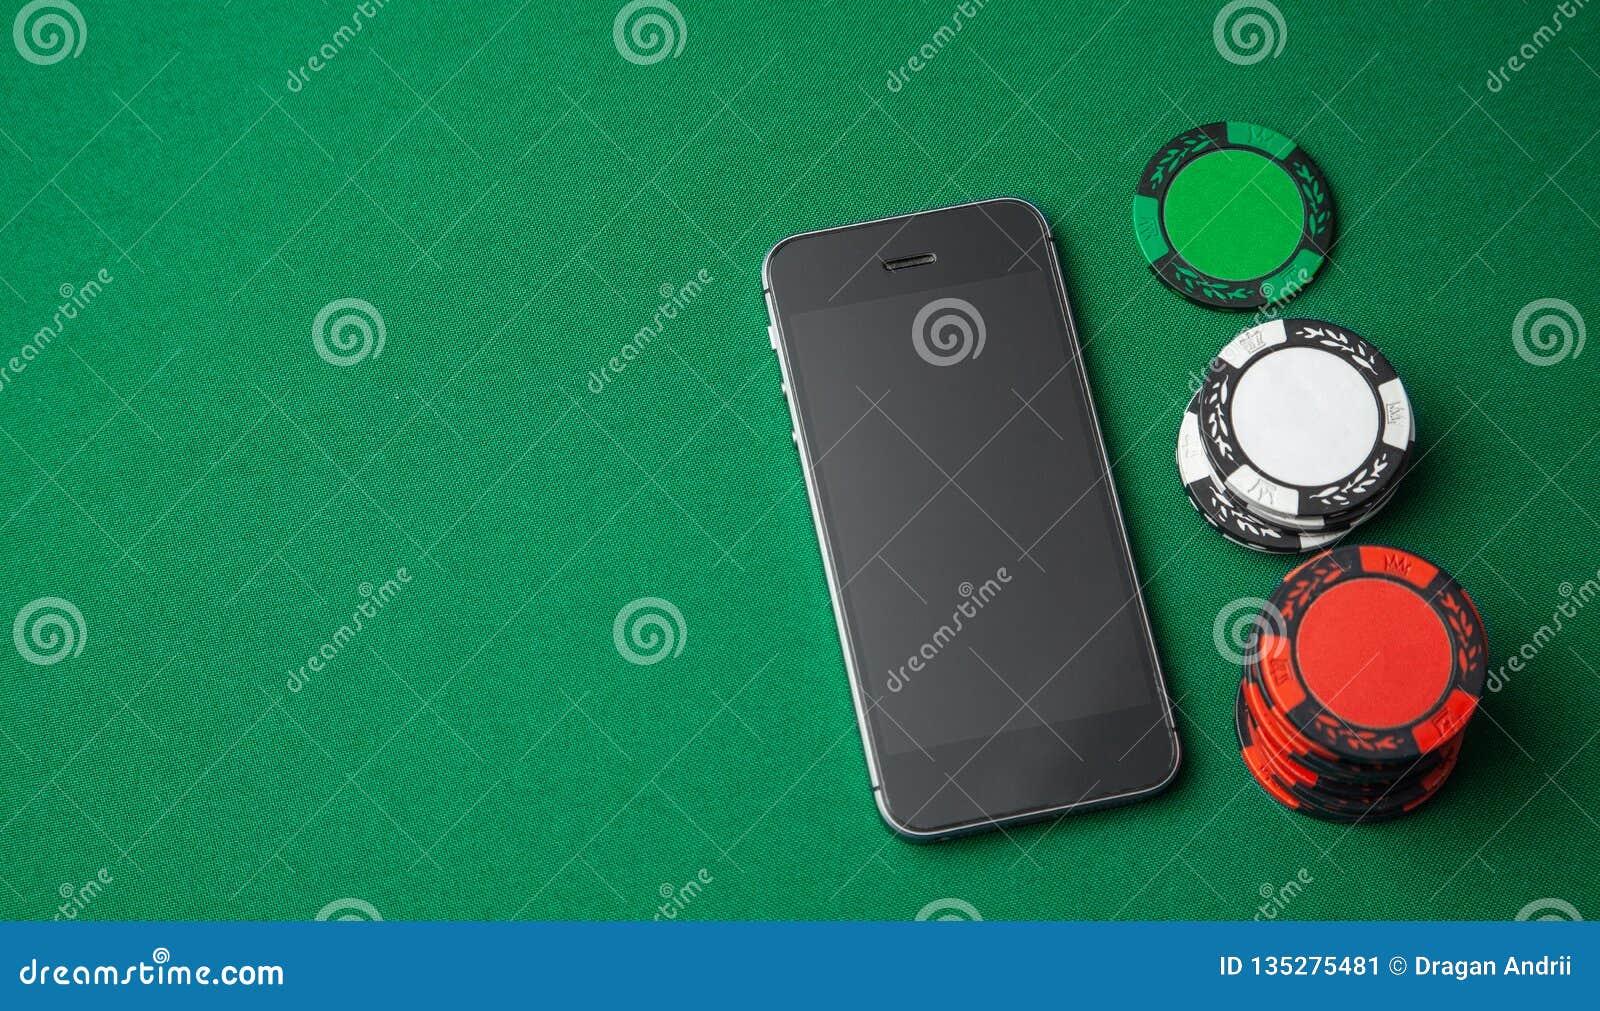 Казино онлайн с телефона монте карло казино зеркало